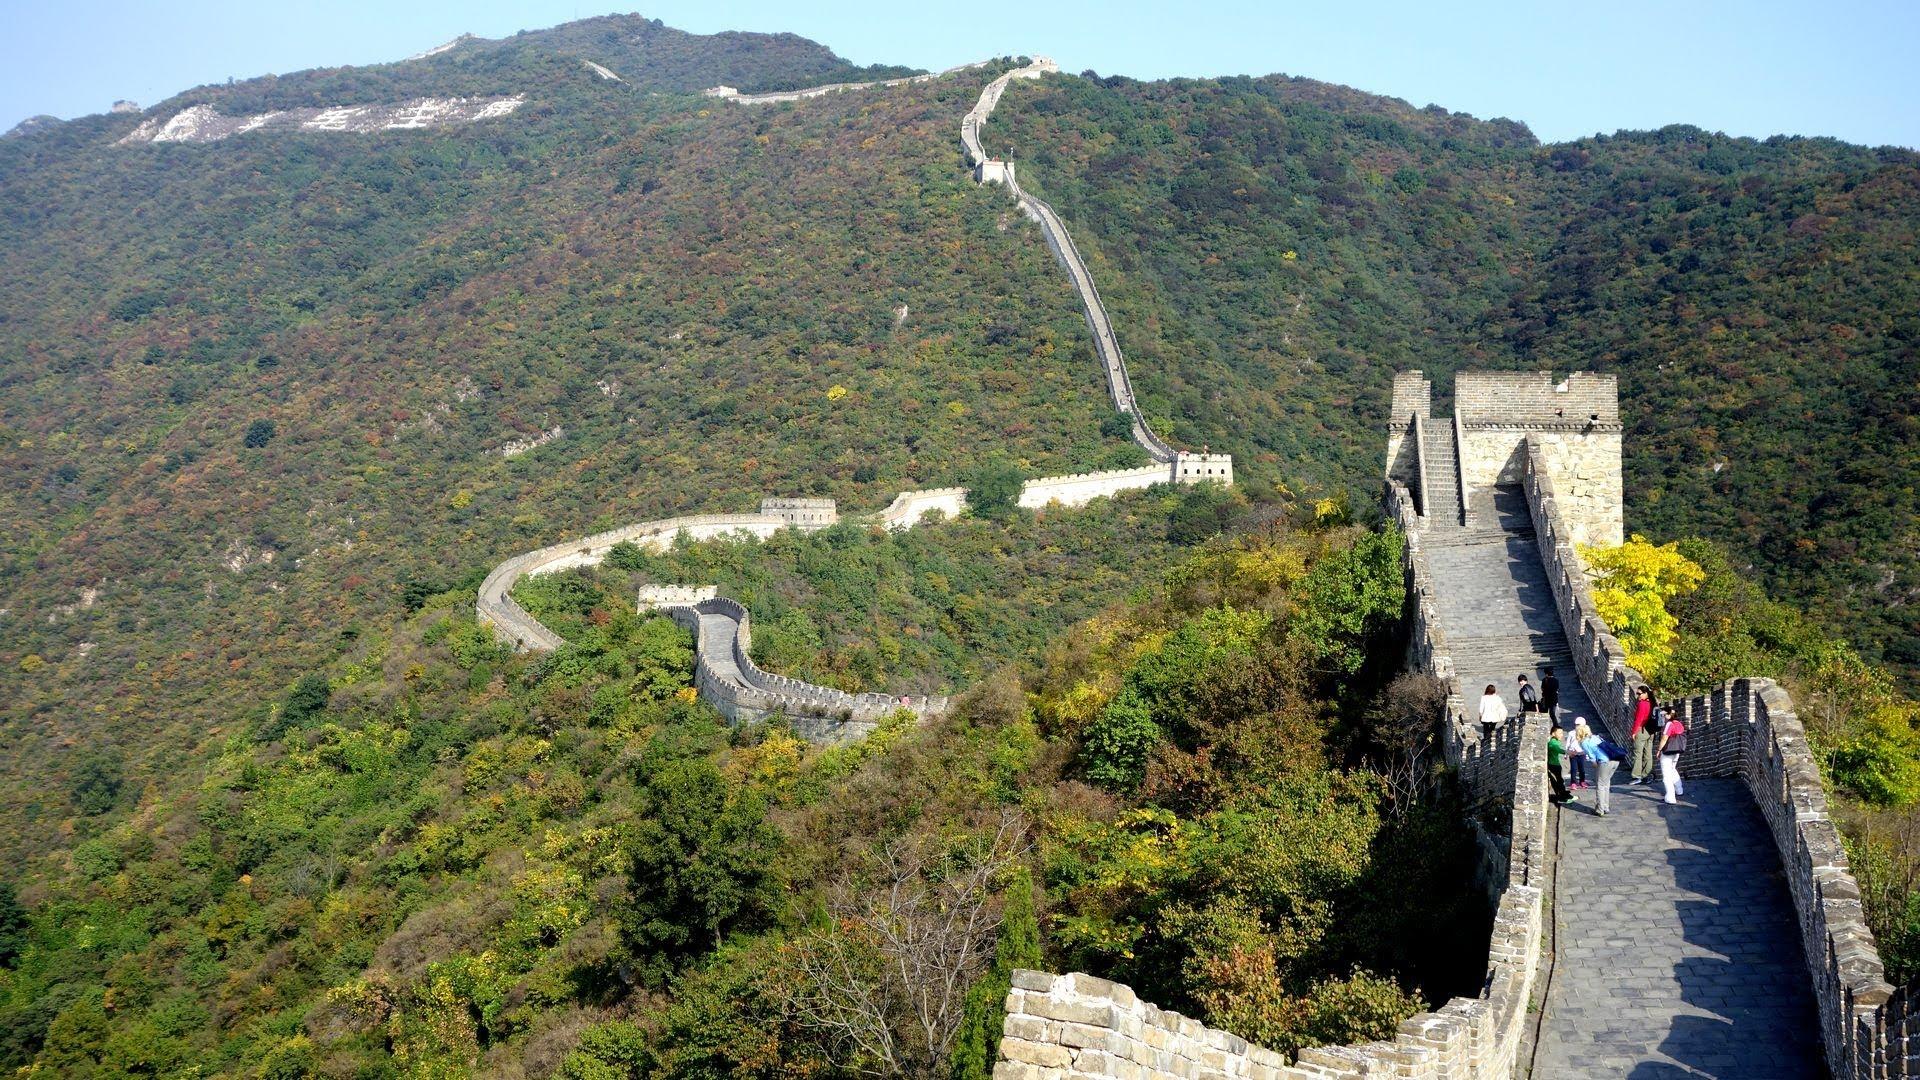 Mutianyu (慕田峪) - A popular Great Wall spot